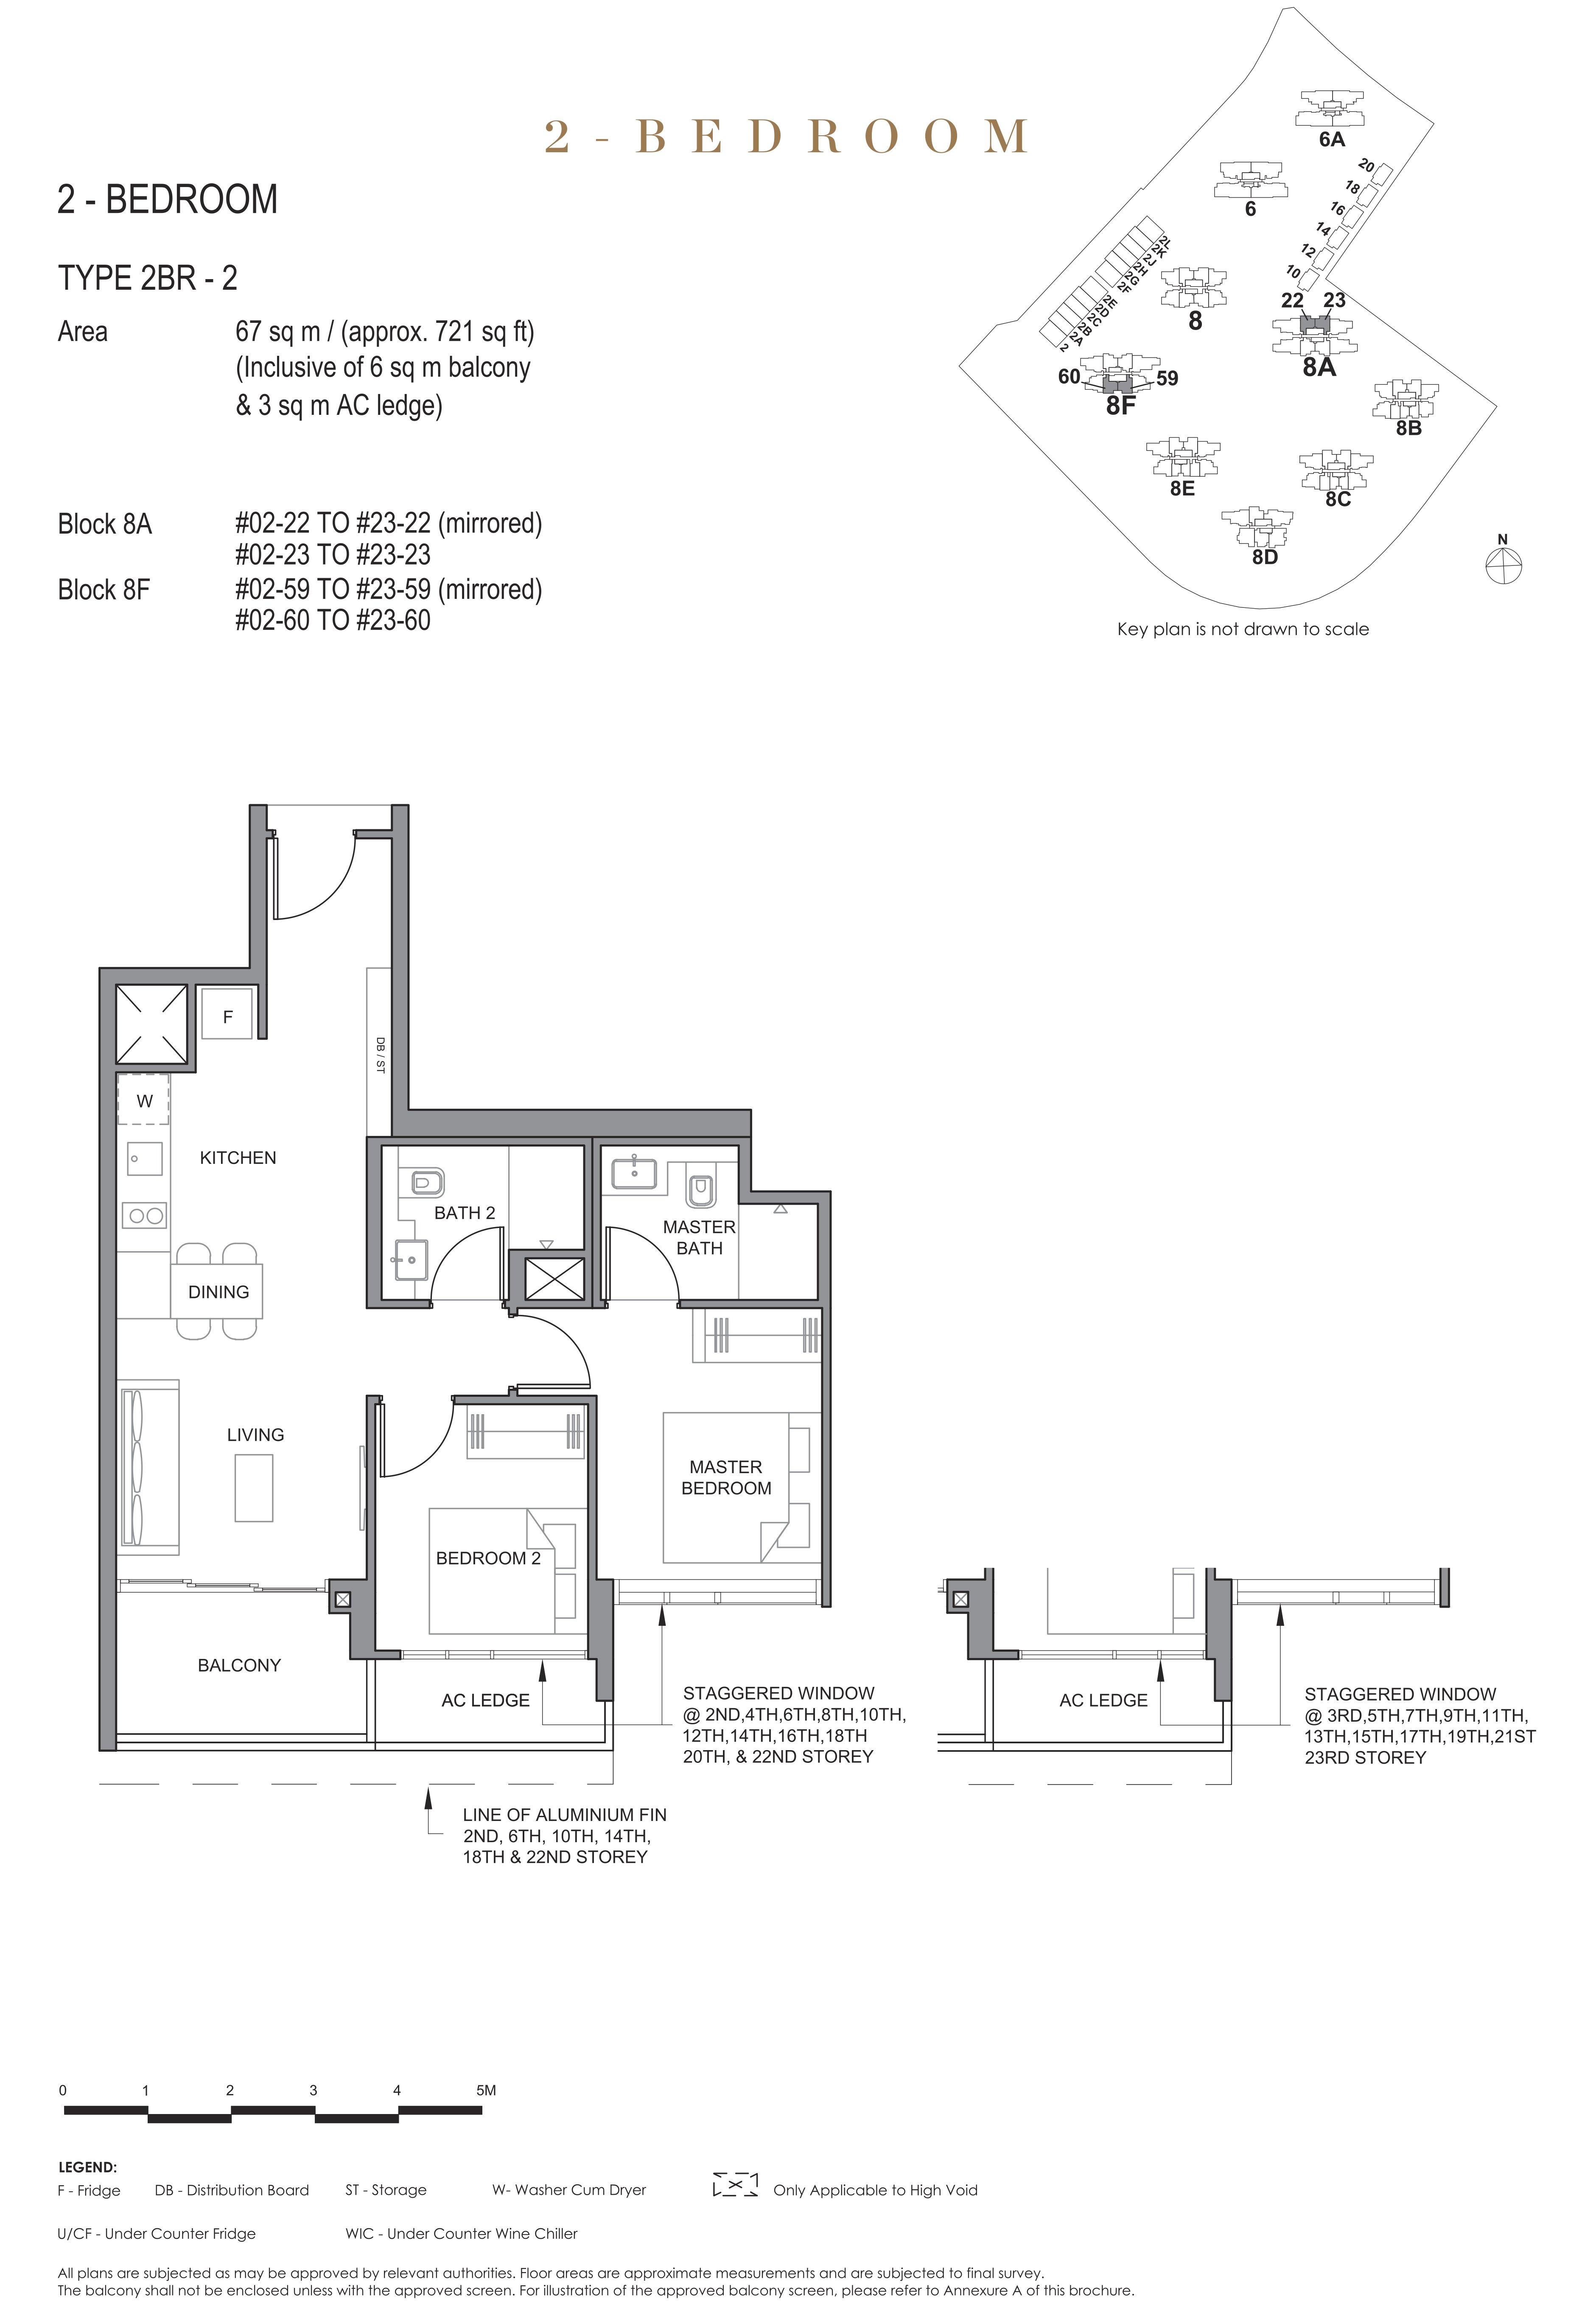 Parc Clematis 锦泰门第 elegance 2 bedroom 2卧房 2BR-2